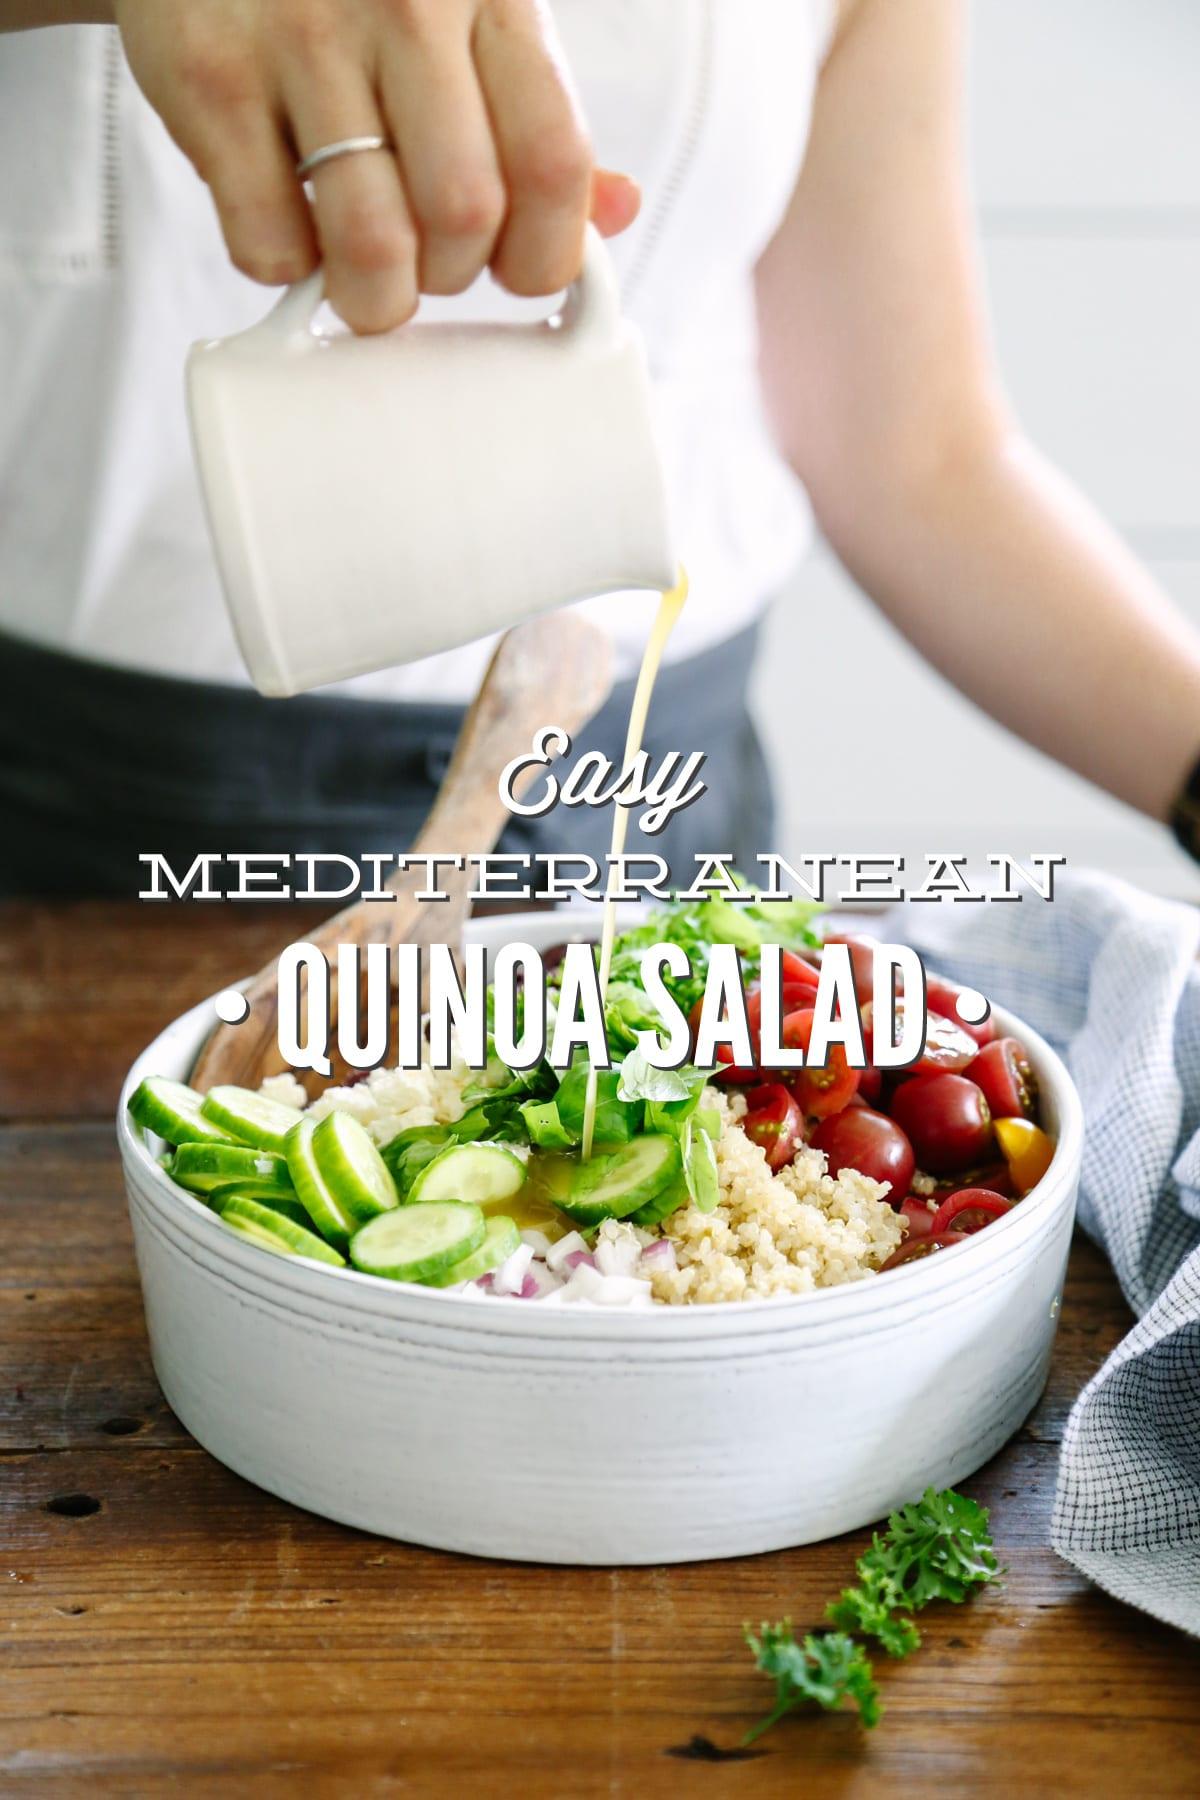 Easy Mediterranean Quinoa Salad